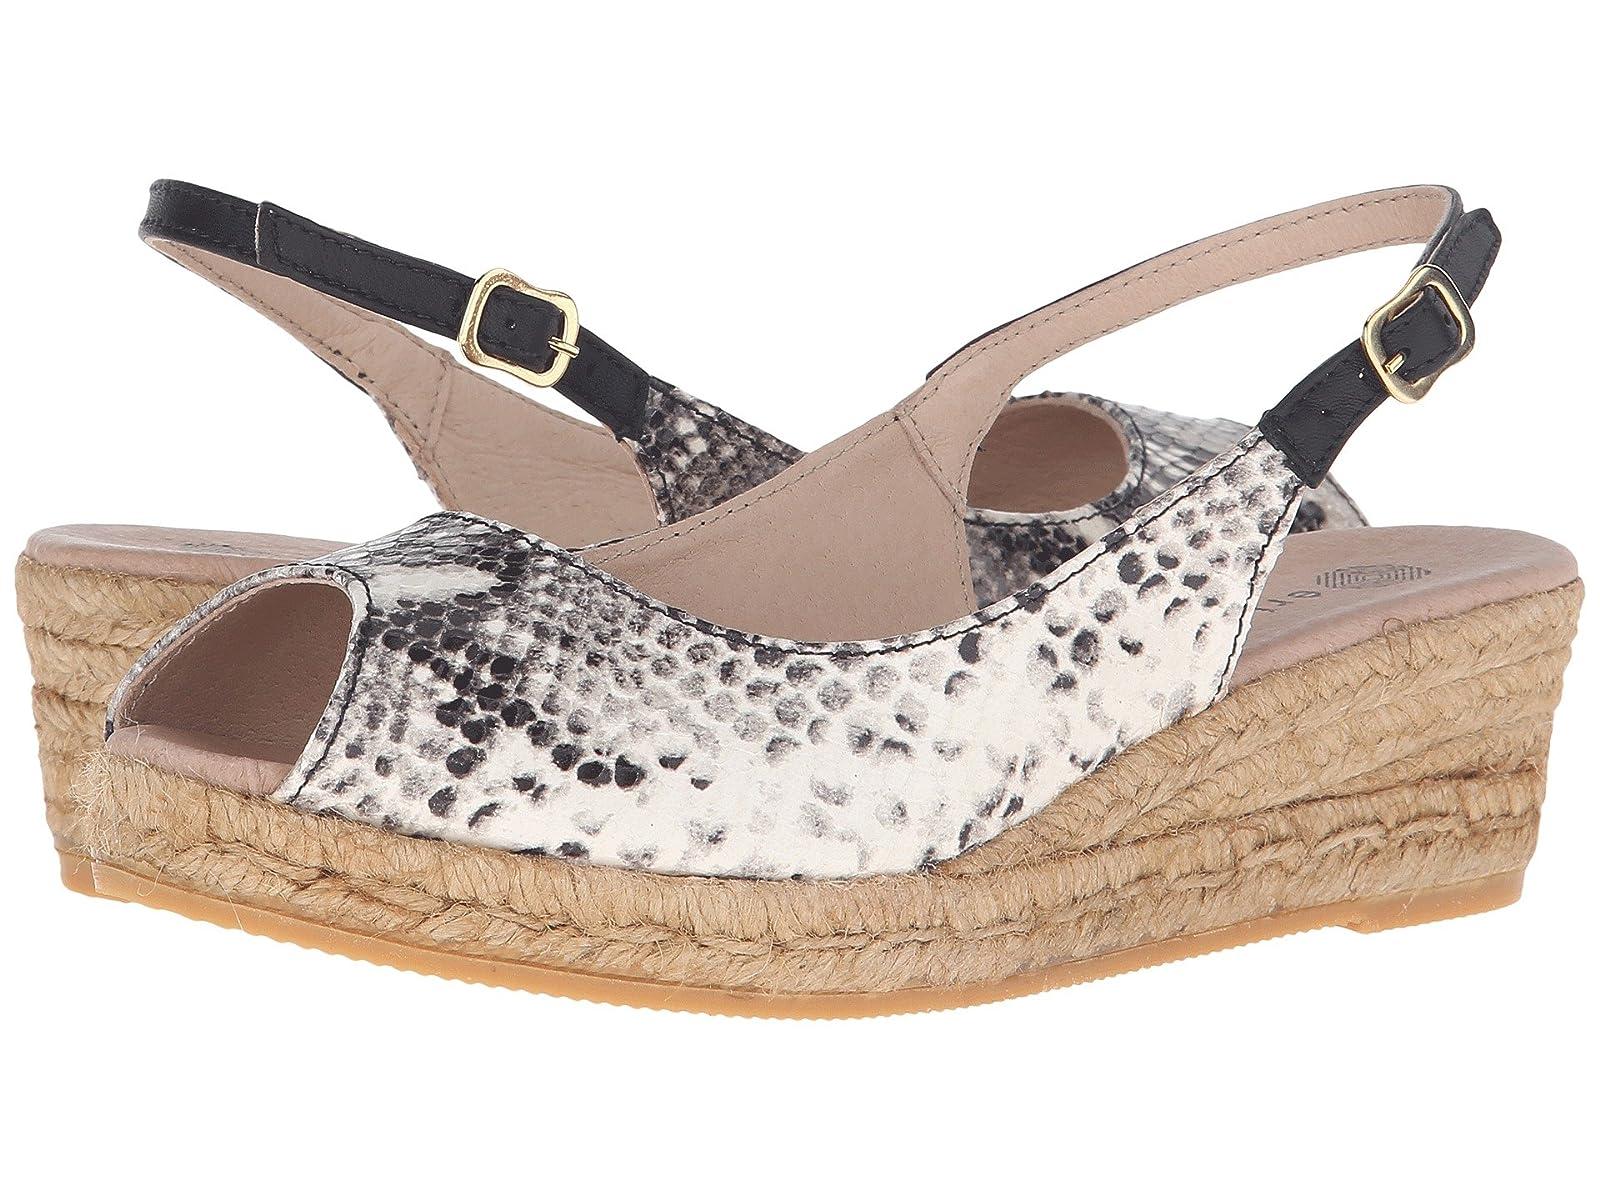 Eric Michael KateCheap and distinctive eye-catching shoes